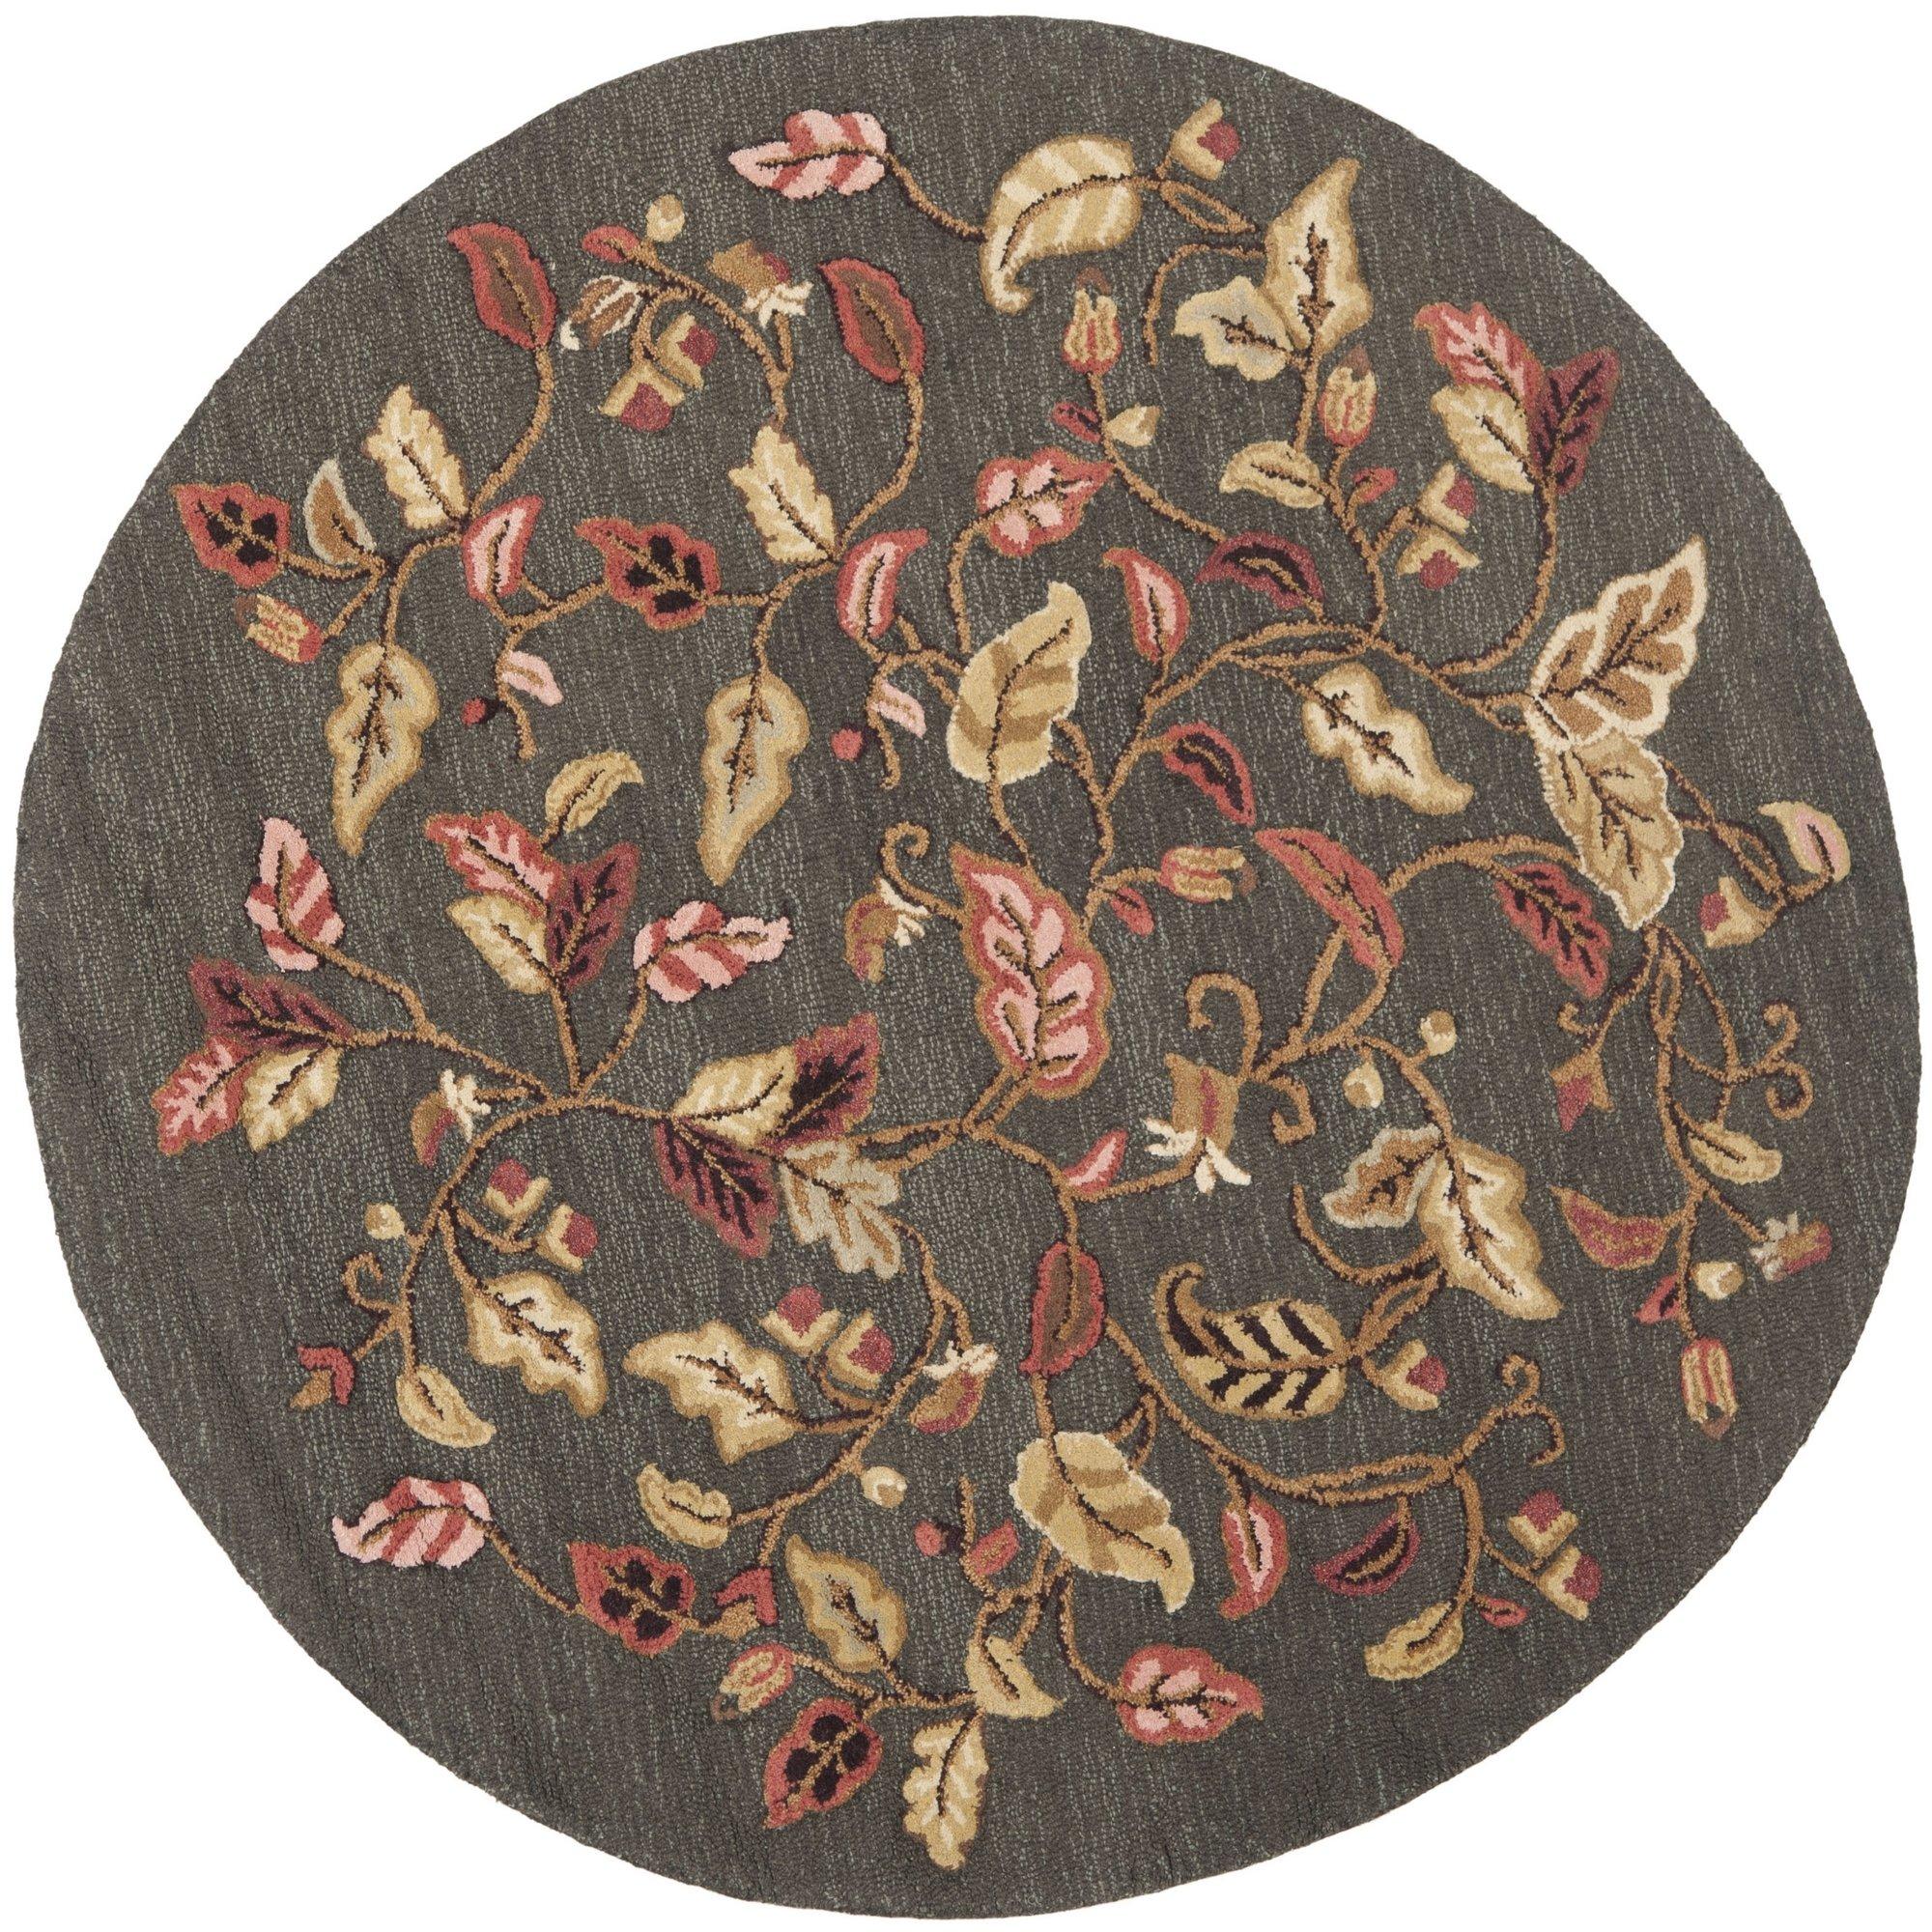 Safavieh Martha Stewart Collection Msr3611b Handmade Autumn Woods Wool Viscose Area Rug 6 X 6 Round Francesca Black Furniture Decor